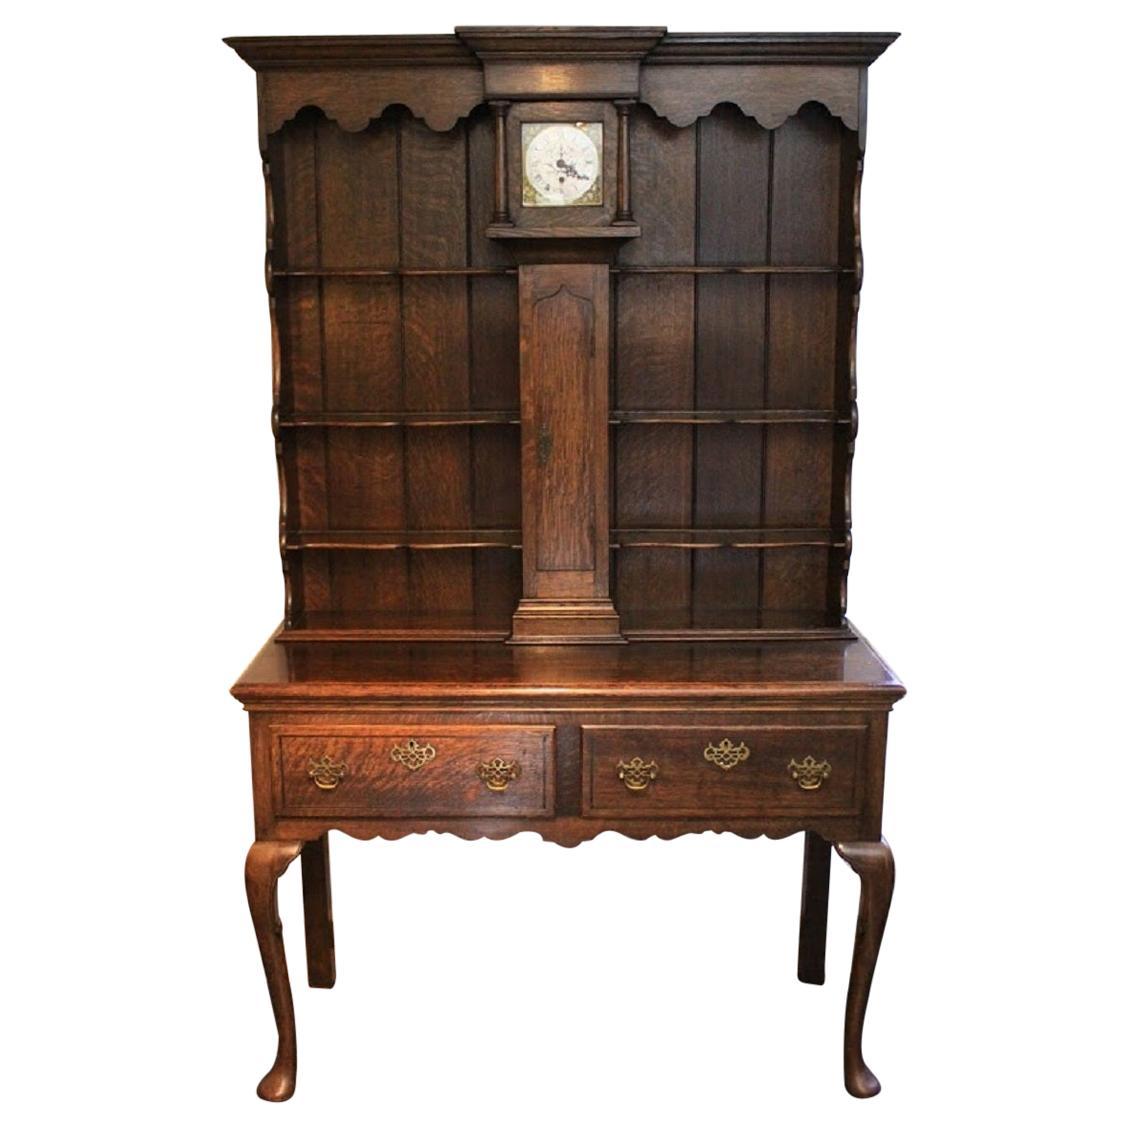 Welsh Oak Dresser with Clock